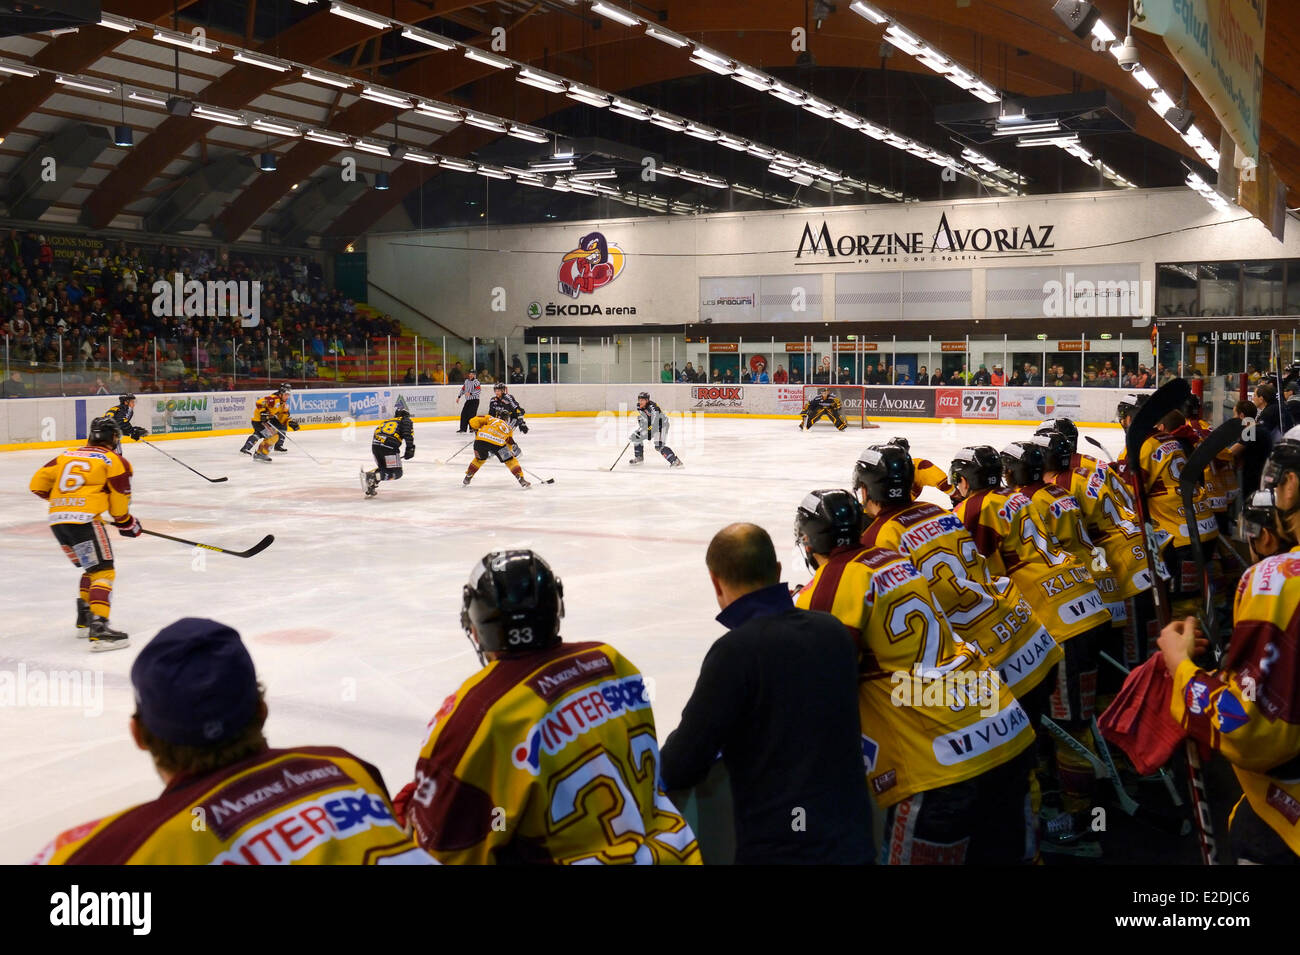 Francia Haute Savoie Morzine hockey su ghiaccio dal Morzine-Avoriaz Hockey Club chiamato i pinguini Immagini Stock